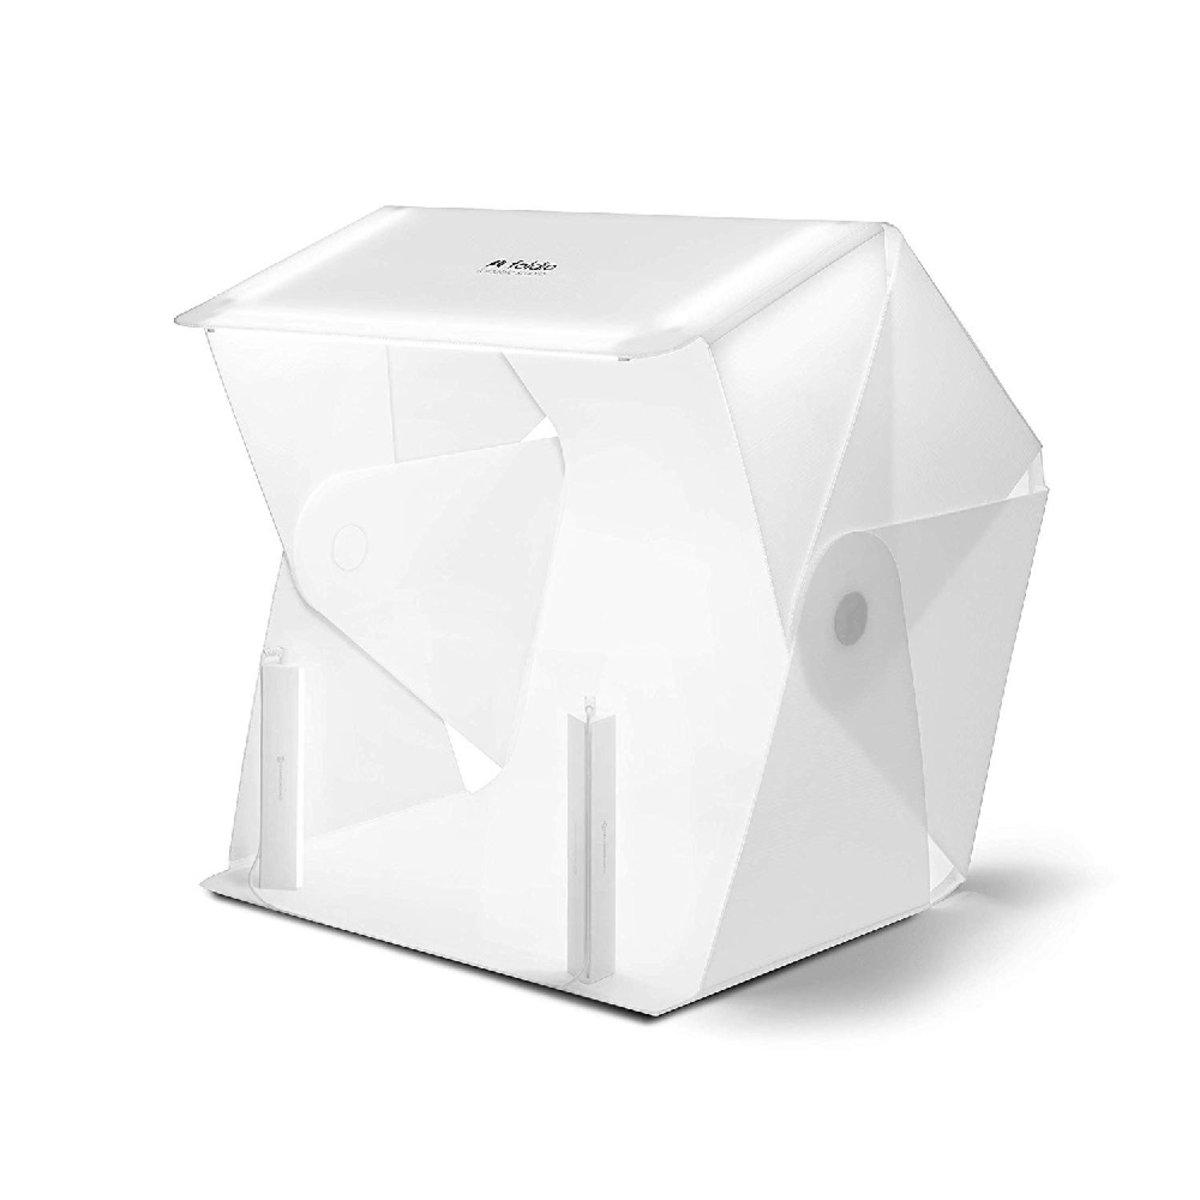 Halo Bar 柔光箱無影燈 (適用於 Foldio 3)